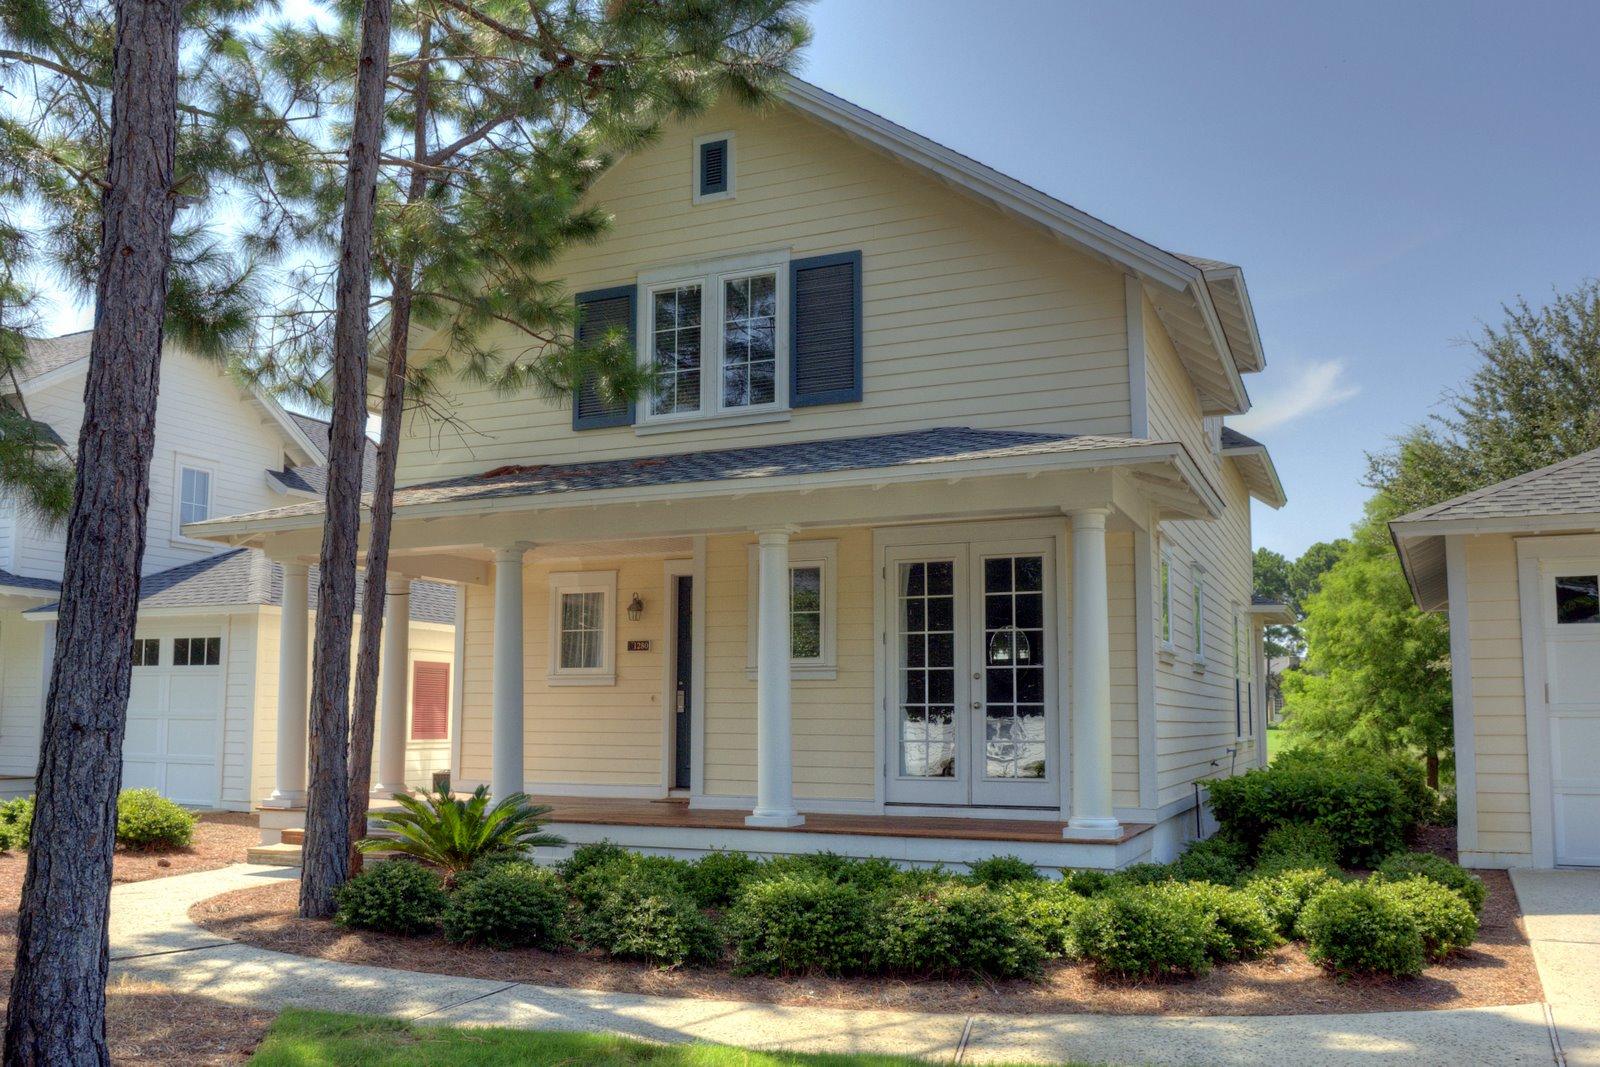 1280 Laurel Grove Condo rental in Sandestin Rentals ~ Cottages and Villas  in Destin Florida - #1